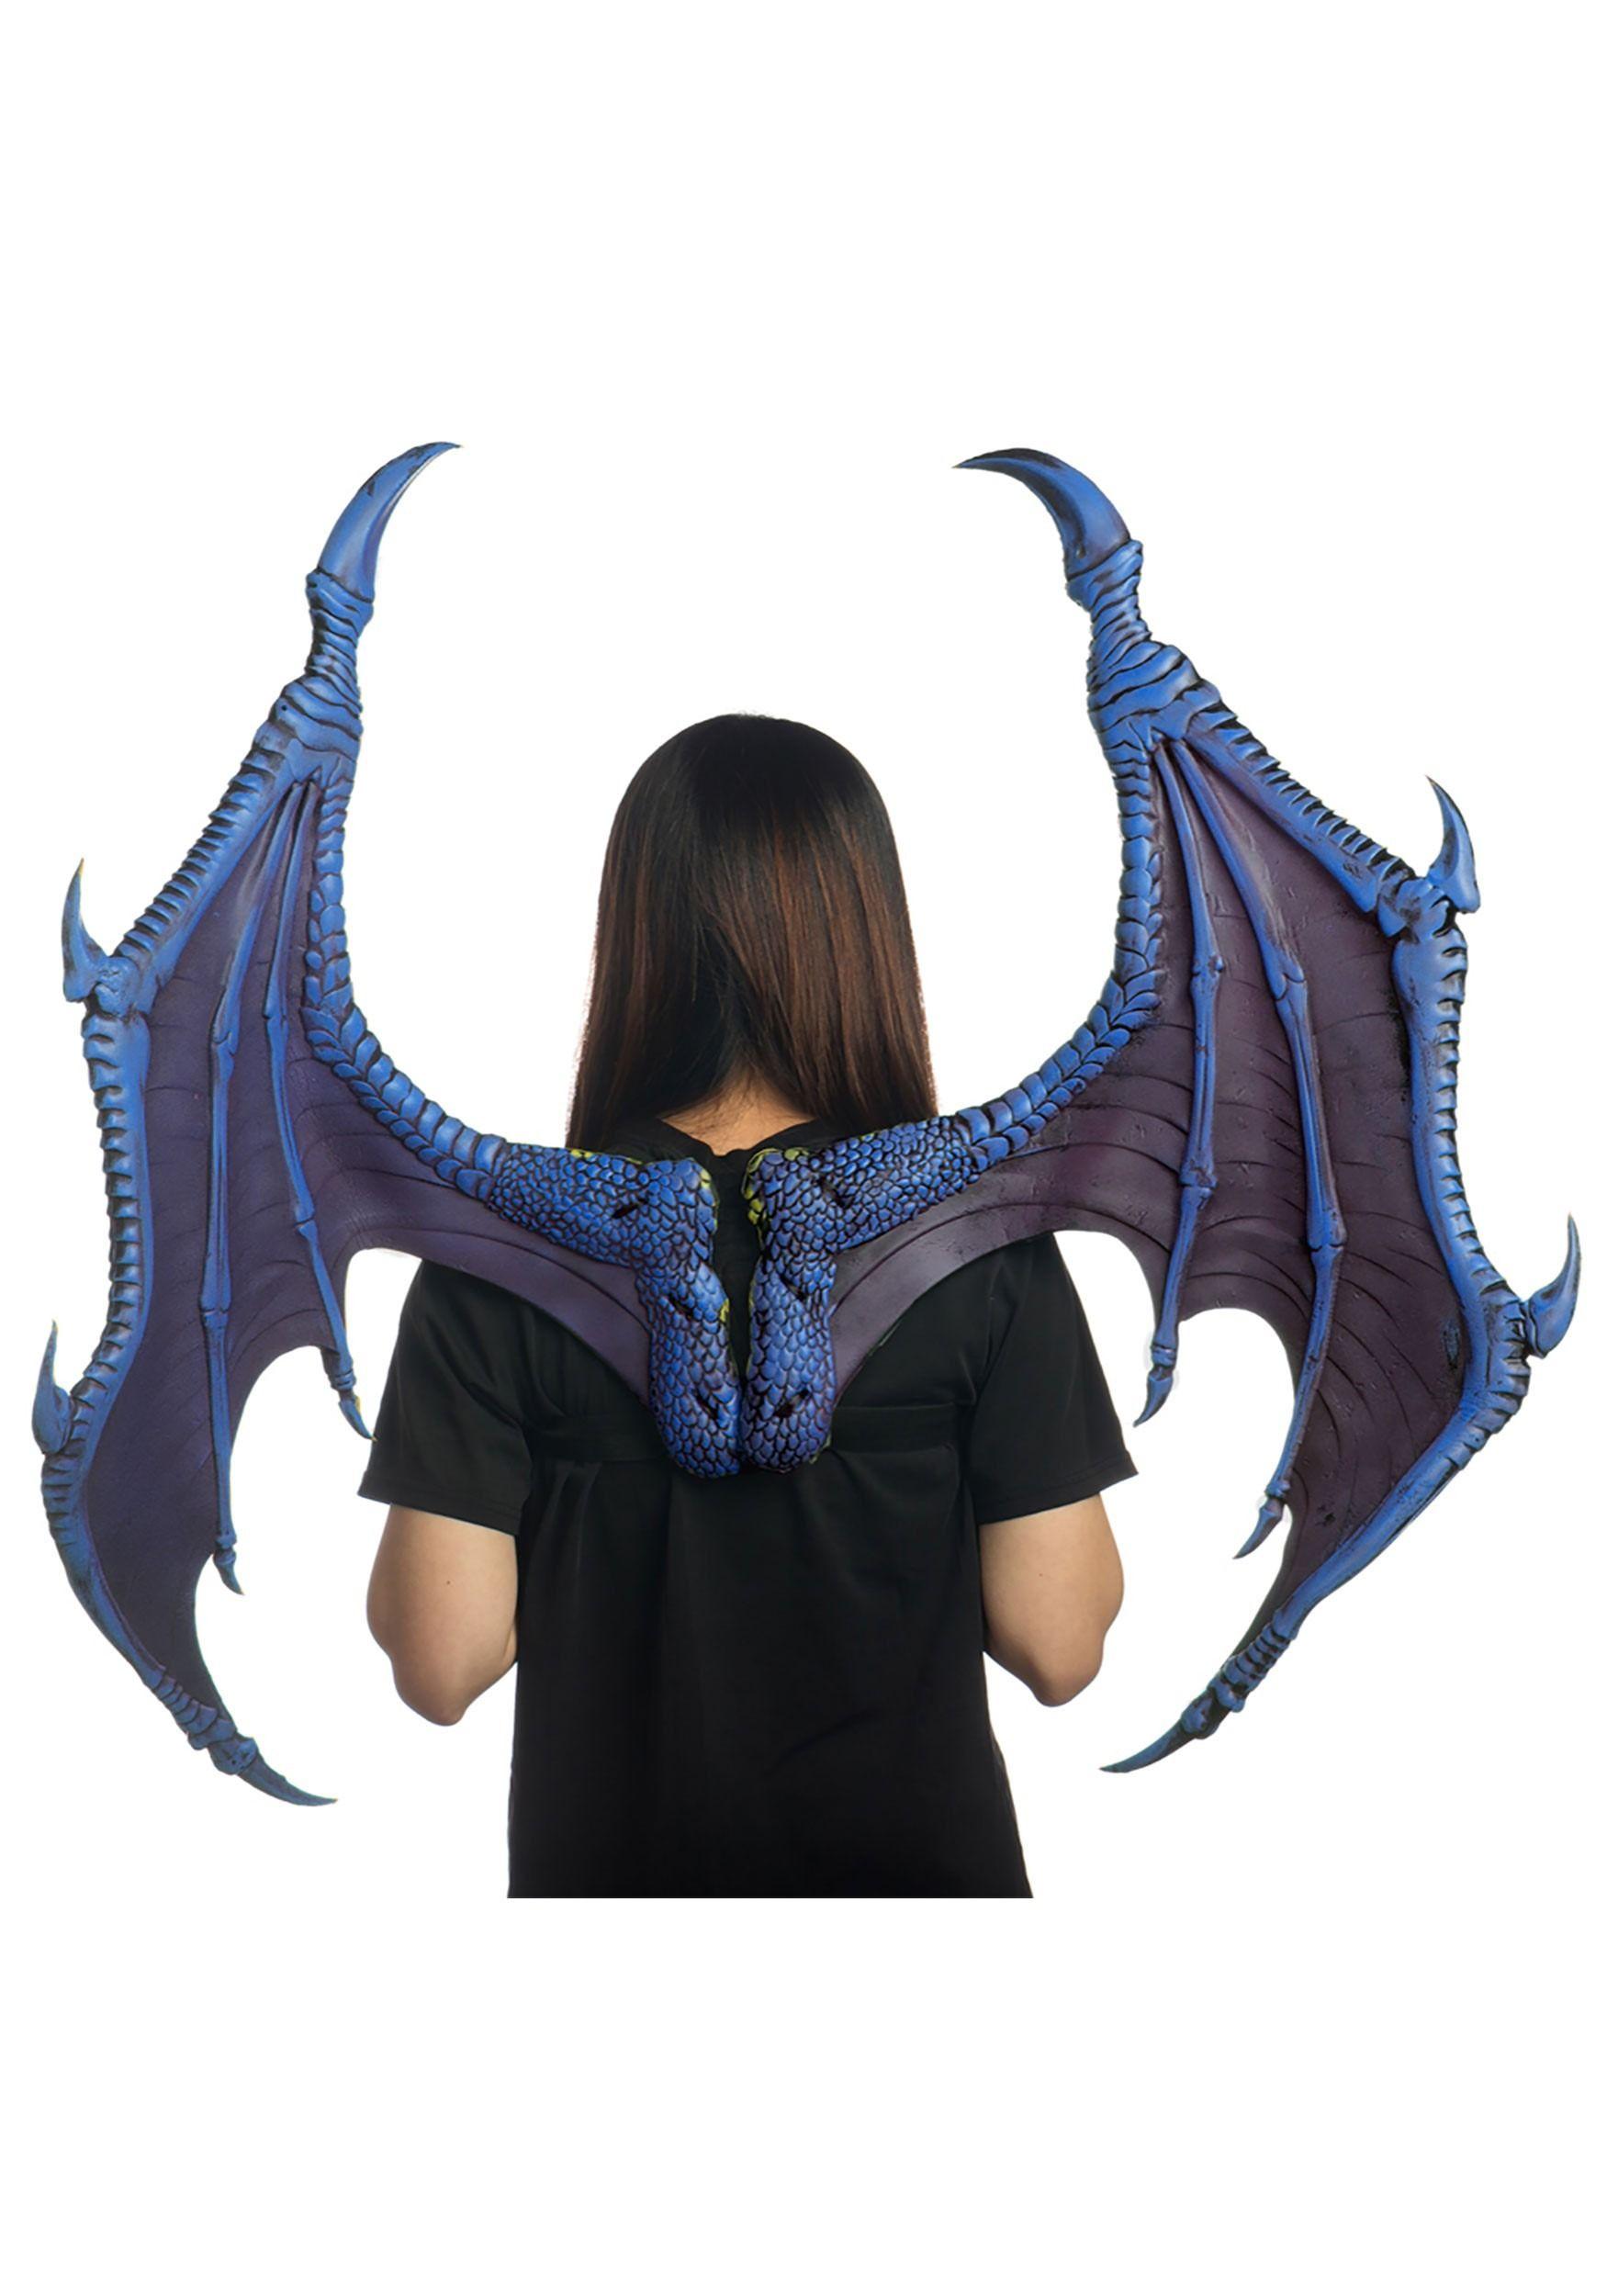 MORESAVE Halloween Fantasy Dragon Kids Cosplay Costume Animal Mask Wing Tail